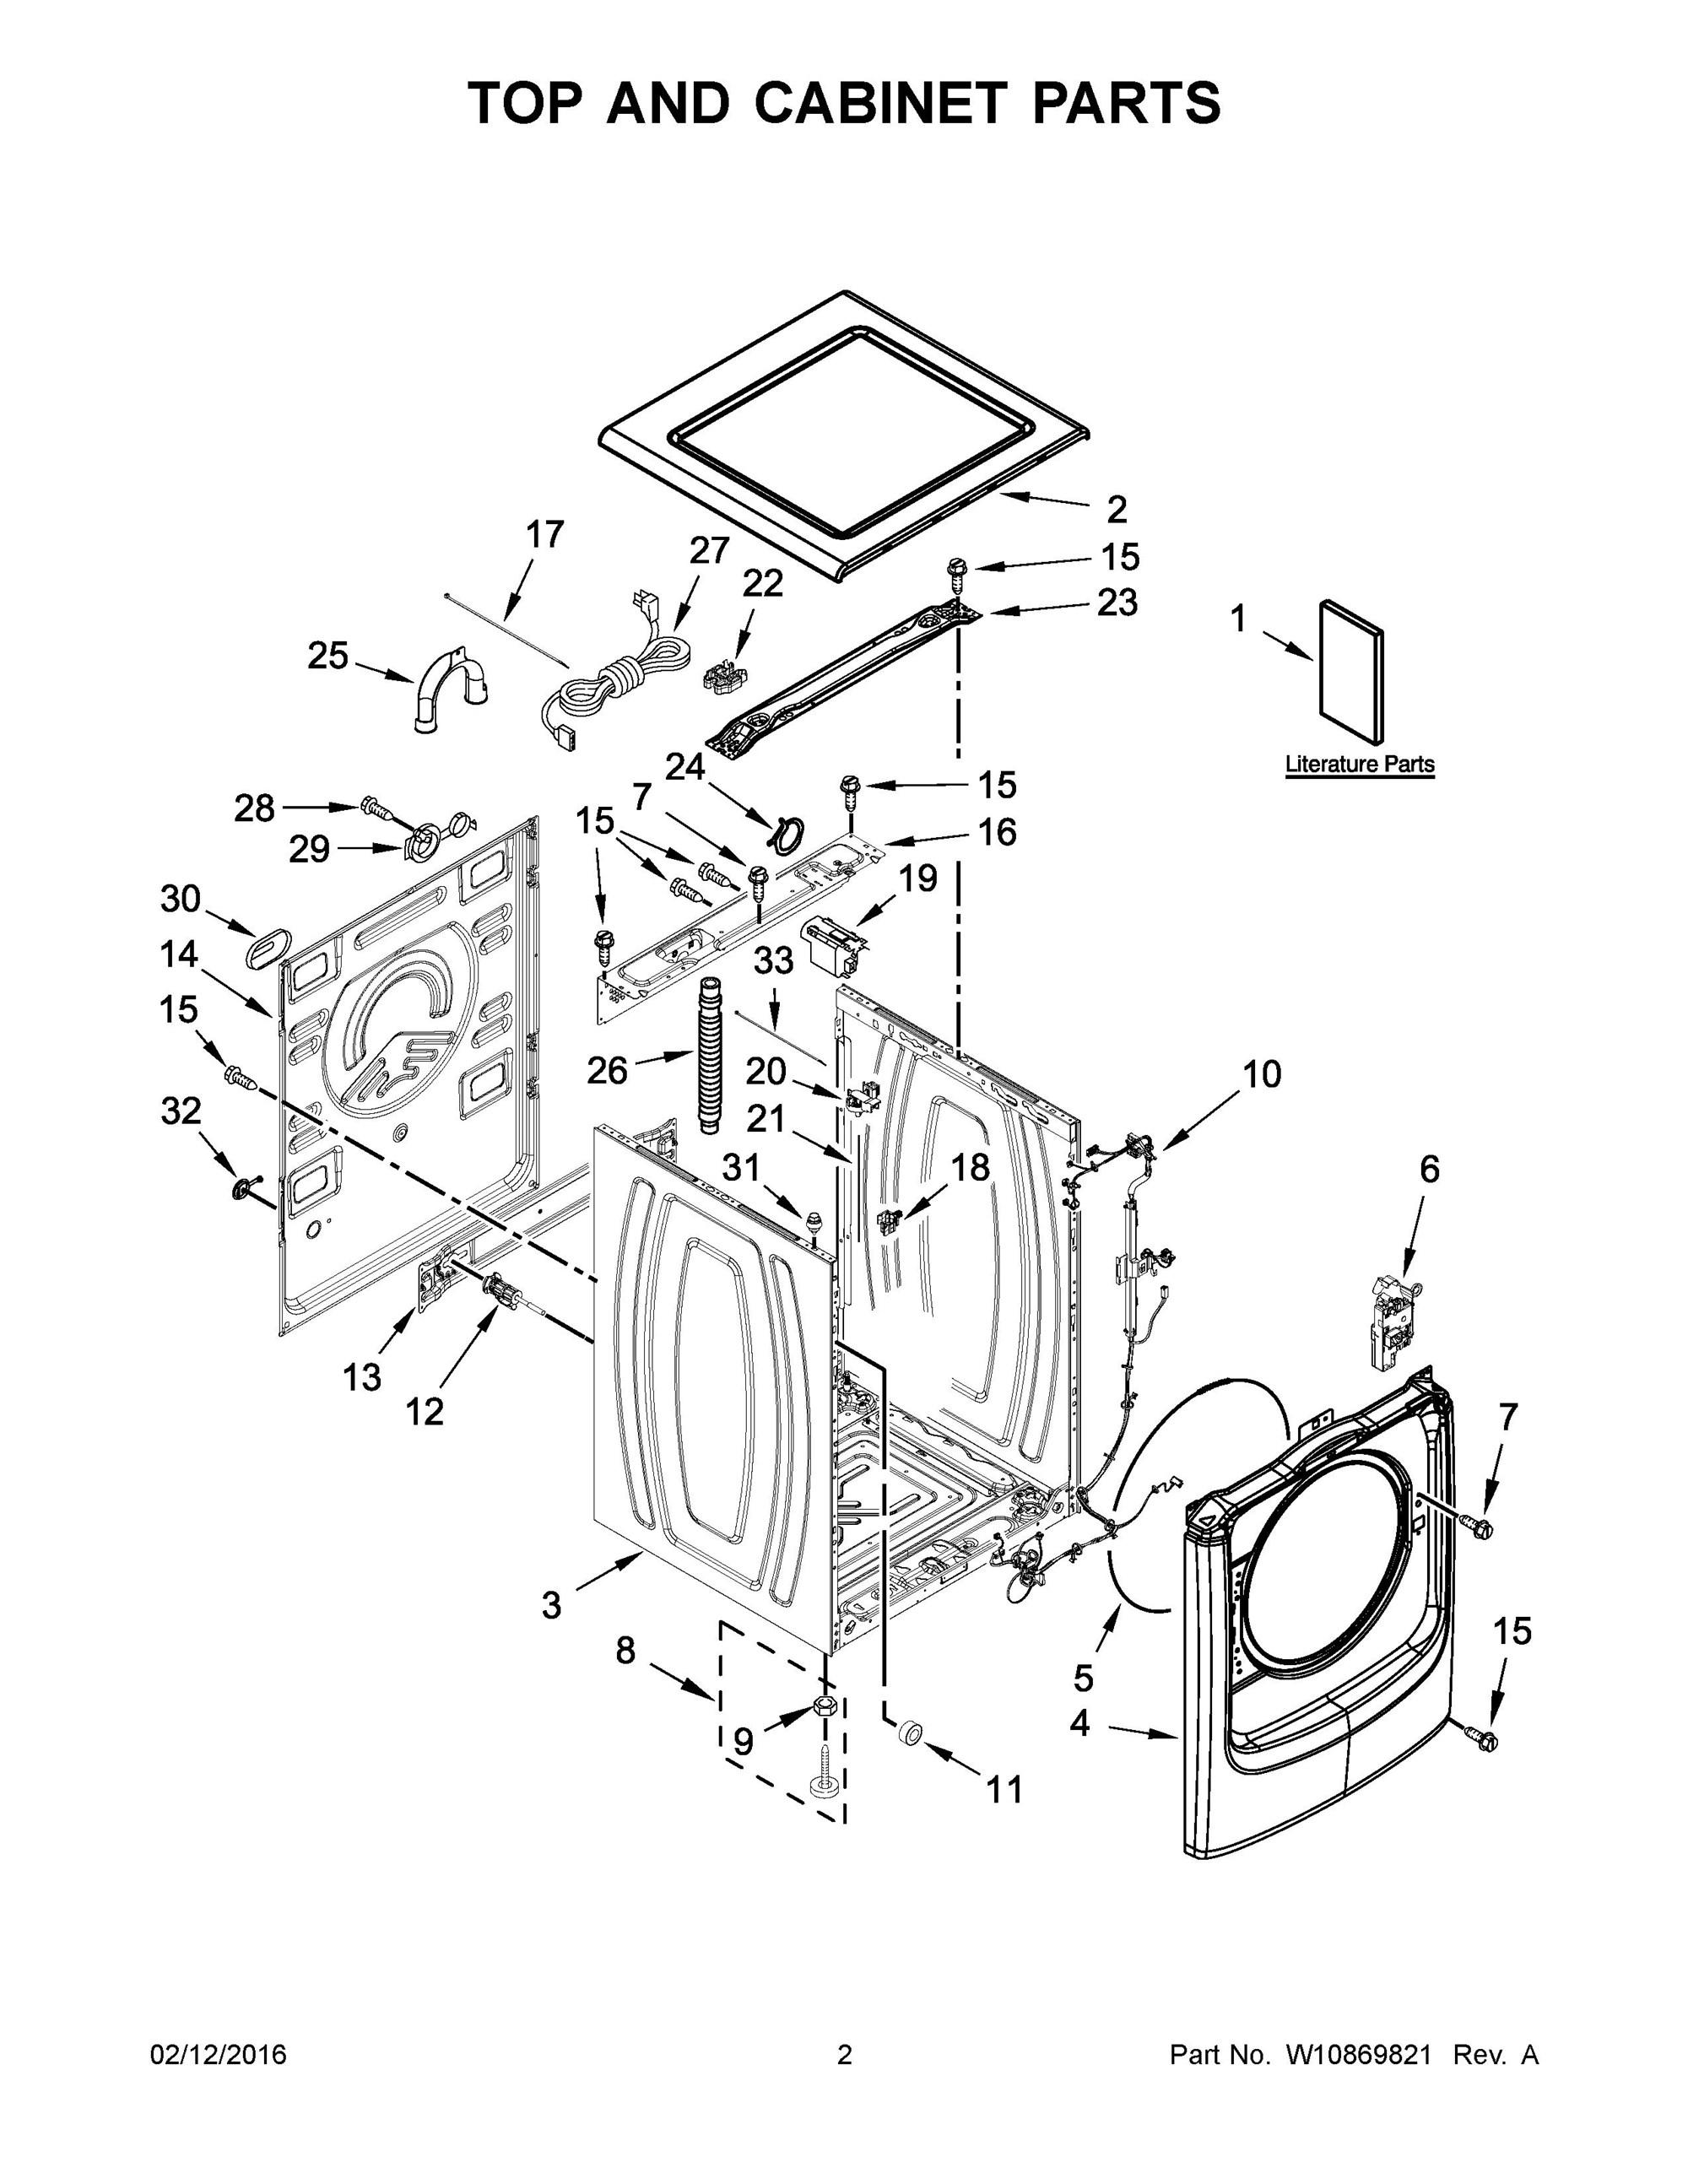 Whirlpool Upright Freezer Schematic Wiring Diagram Master Blogs Trash Compactor Wzf34x16dw Manual